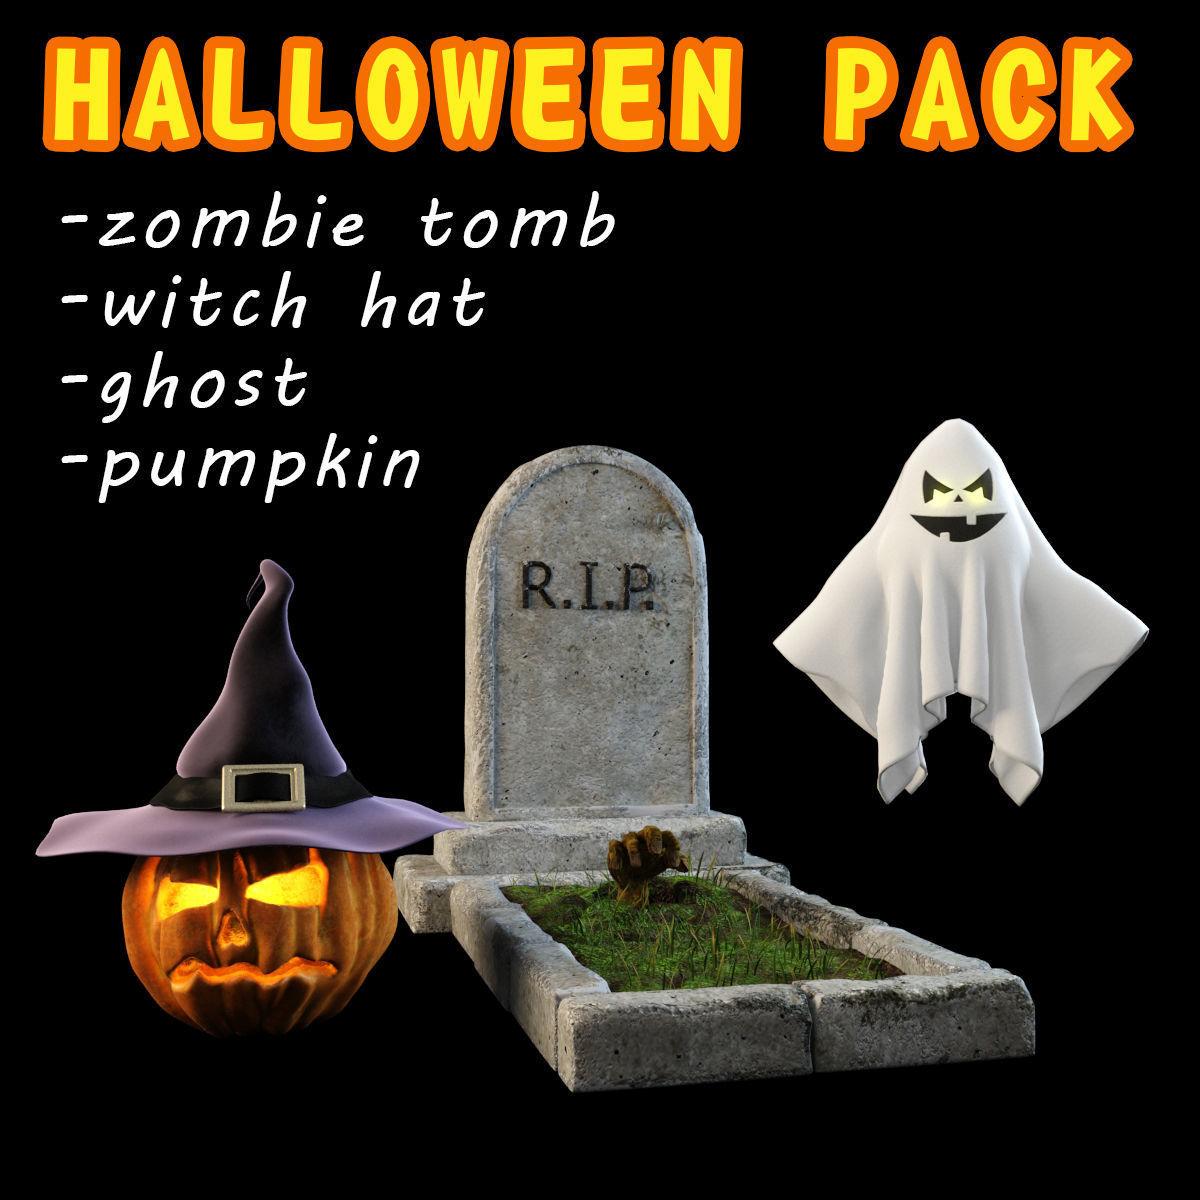 Halloween pack 4 items